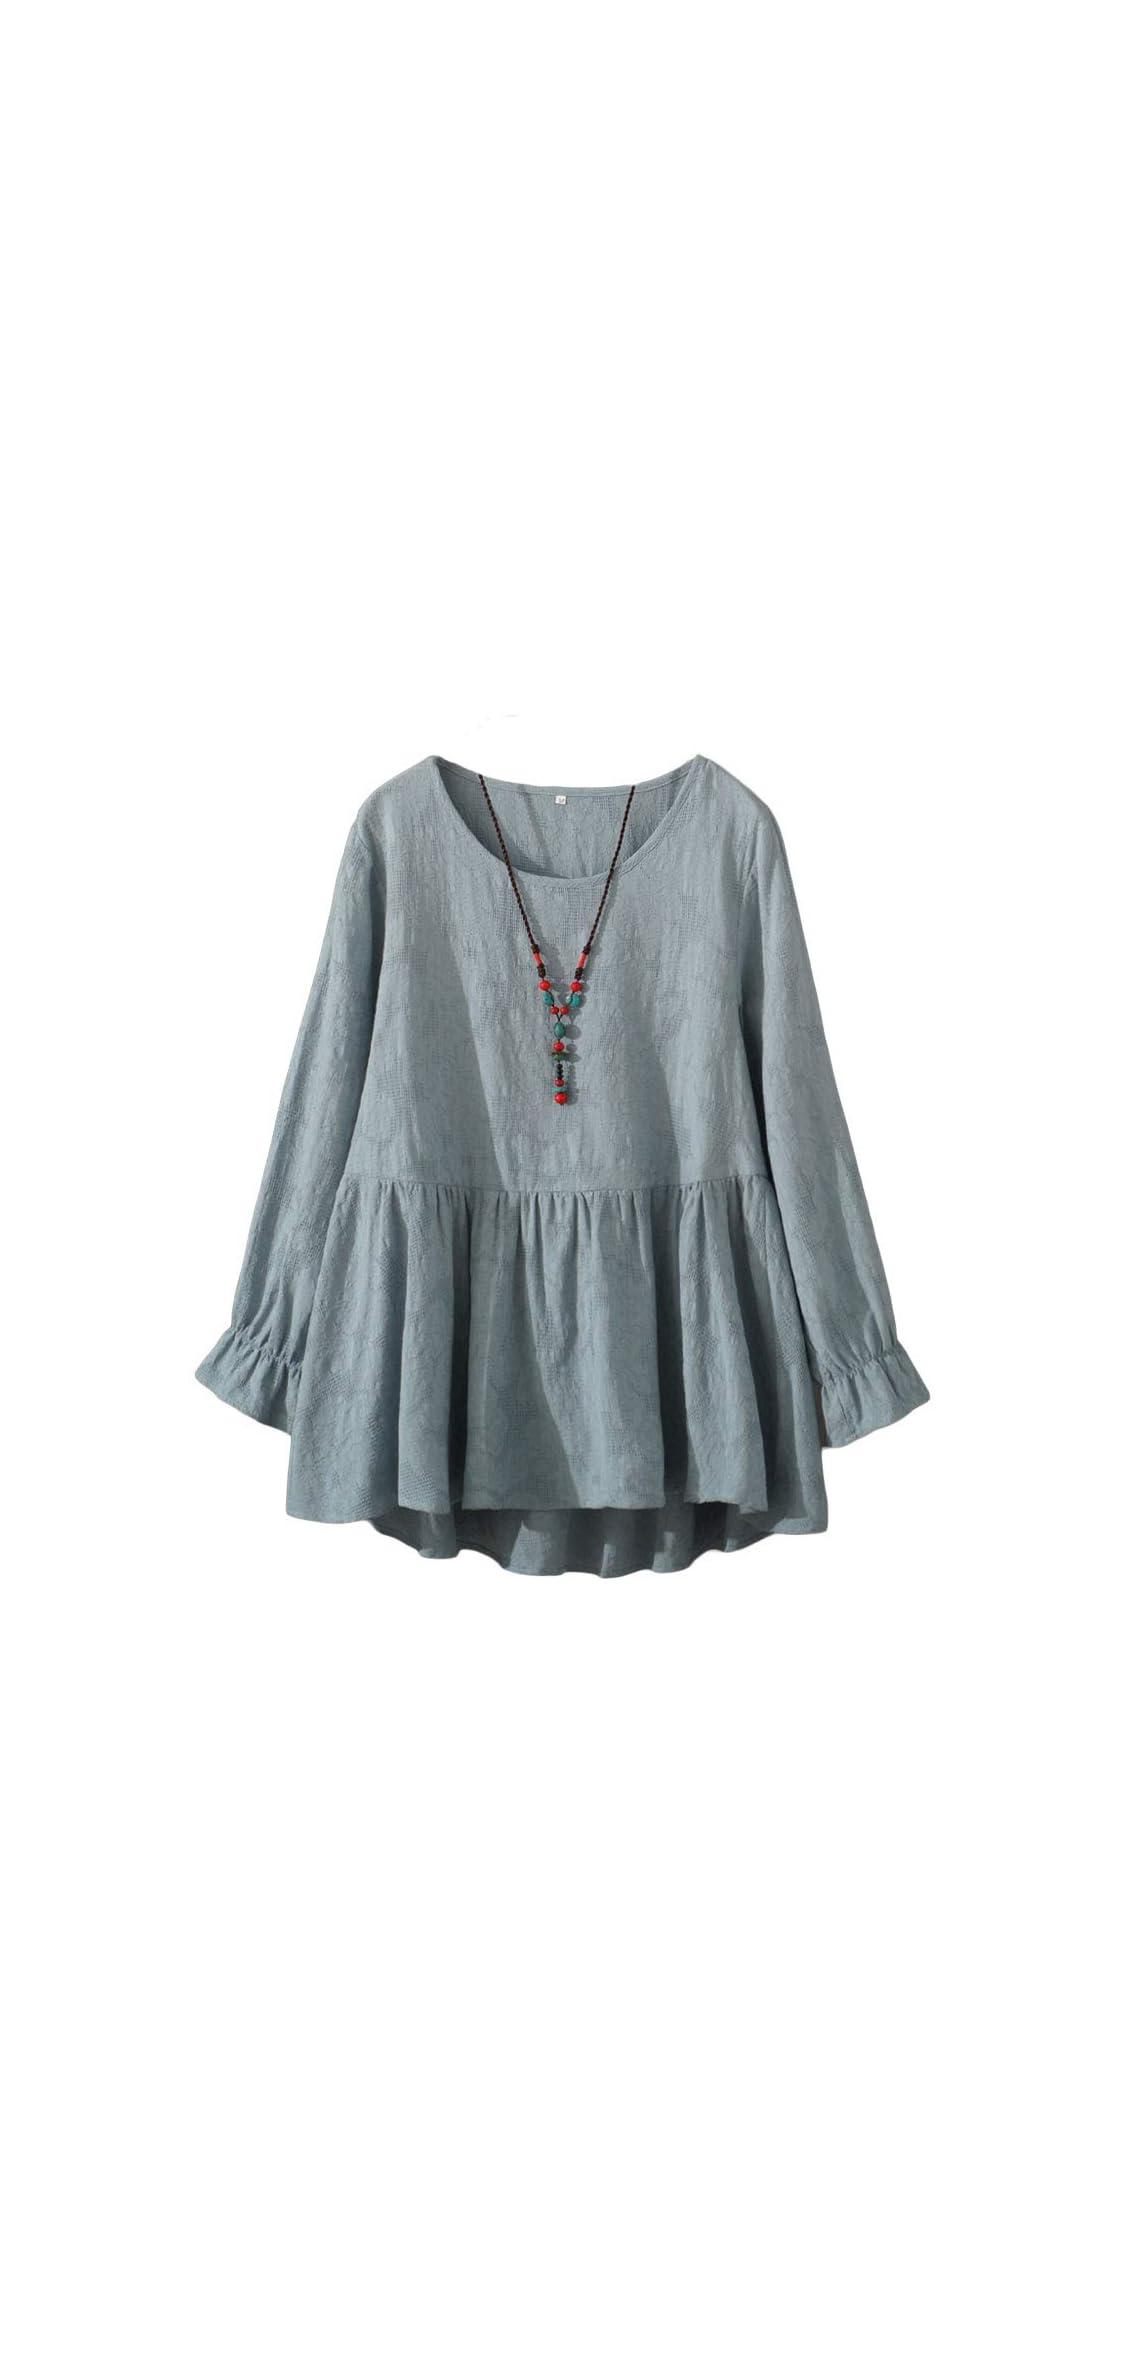 Women's Cotton Tunic Tops Long Sleeve Swing Pleated